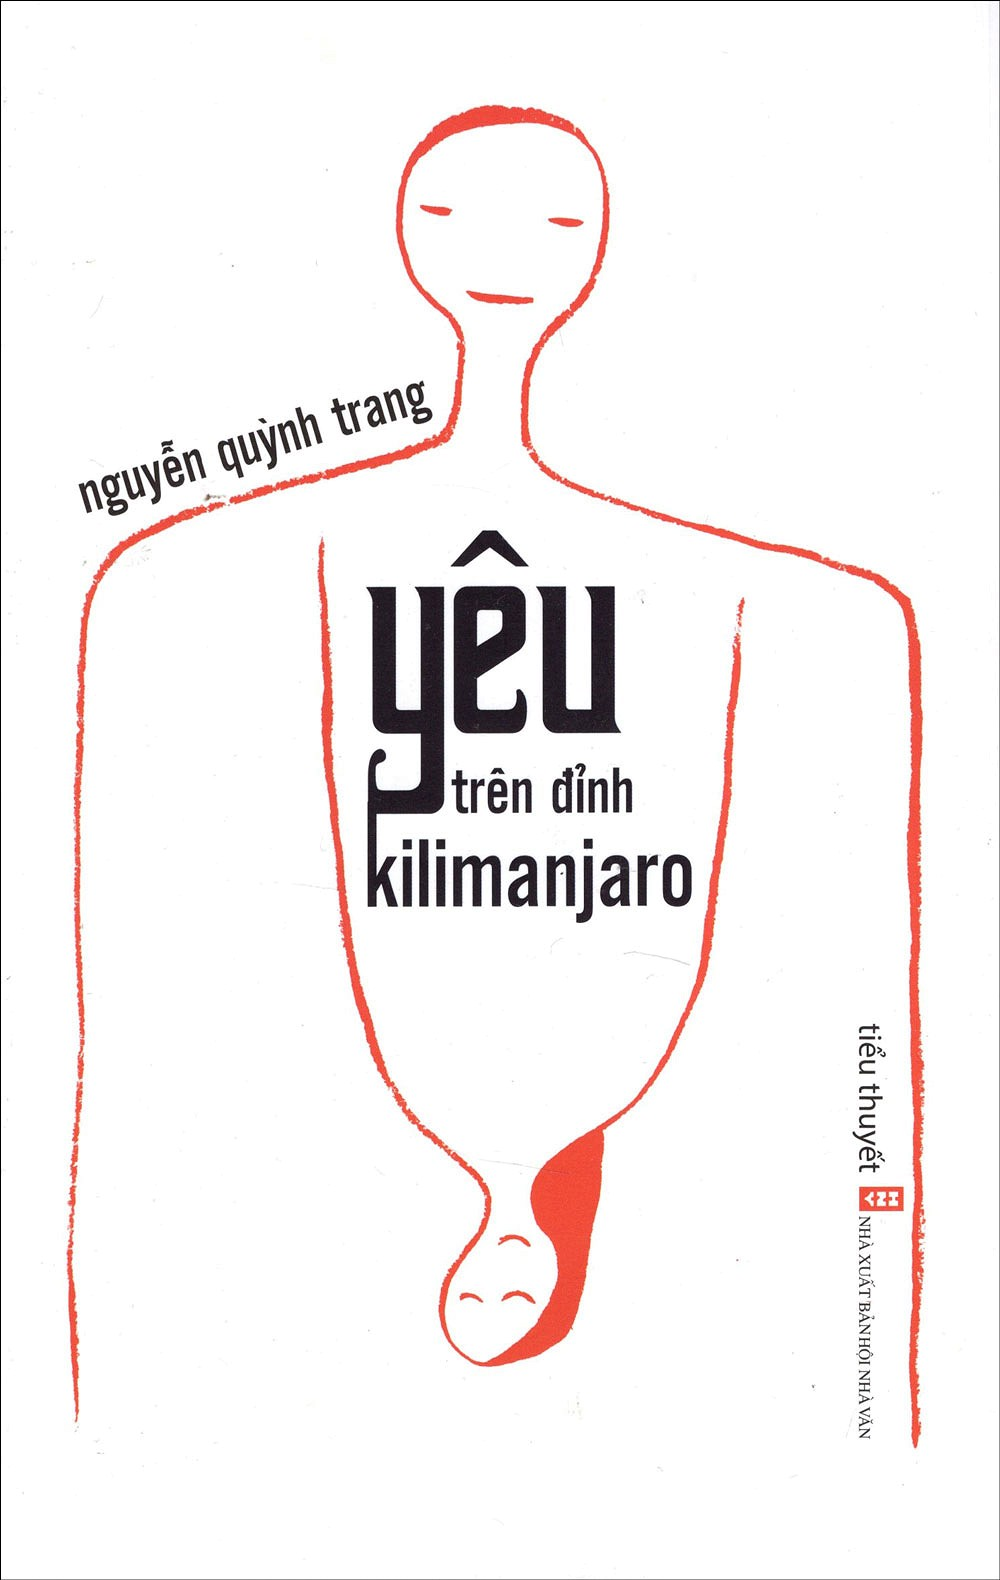 yeu-tren-dinh-kilimanjiaro.u547.d20161026.t090005.412835_1.jpg